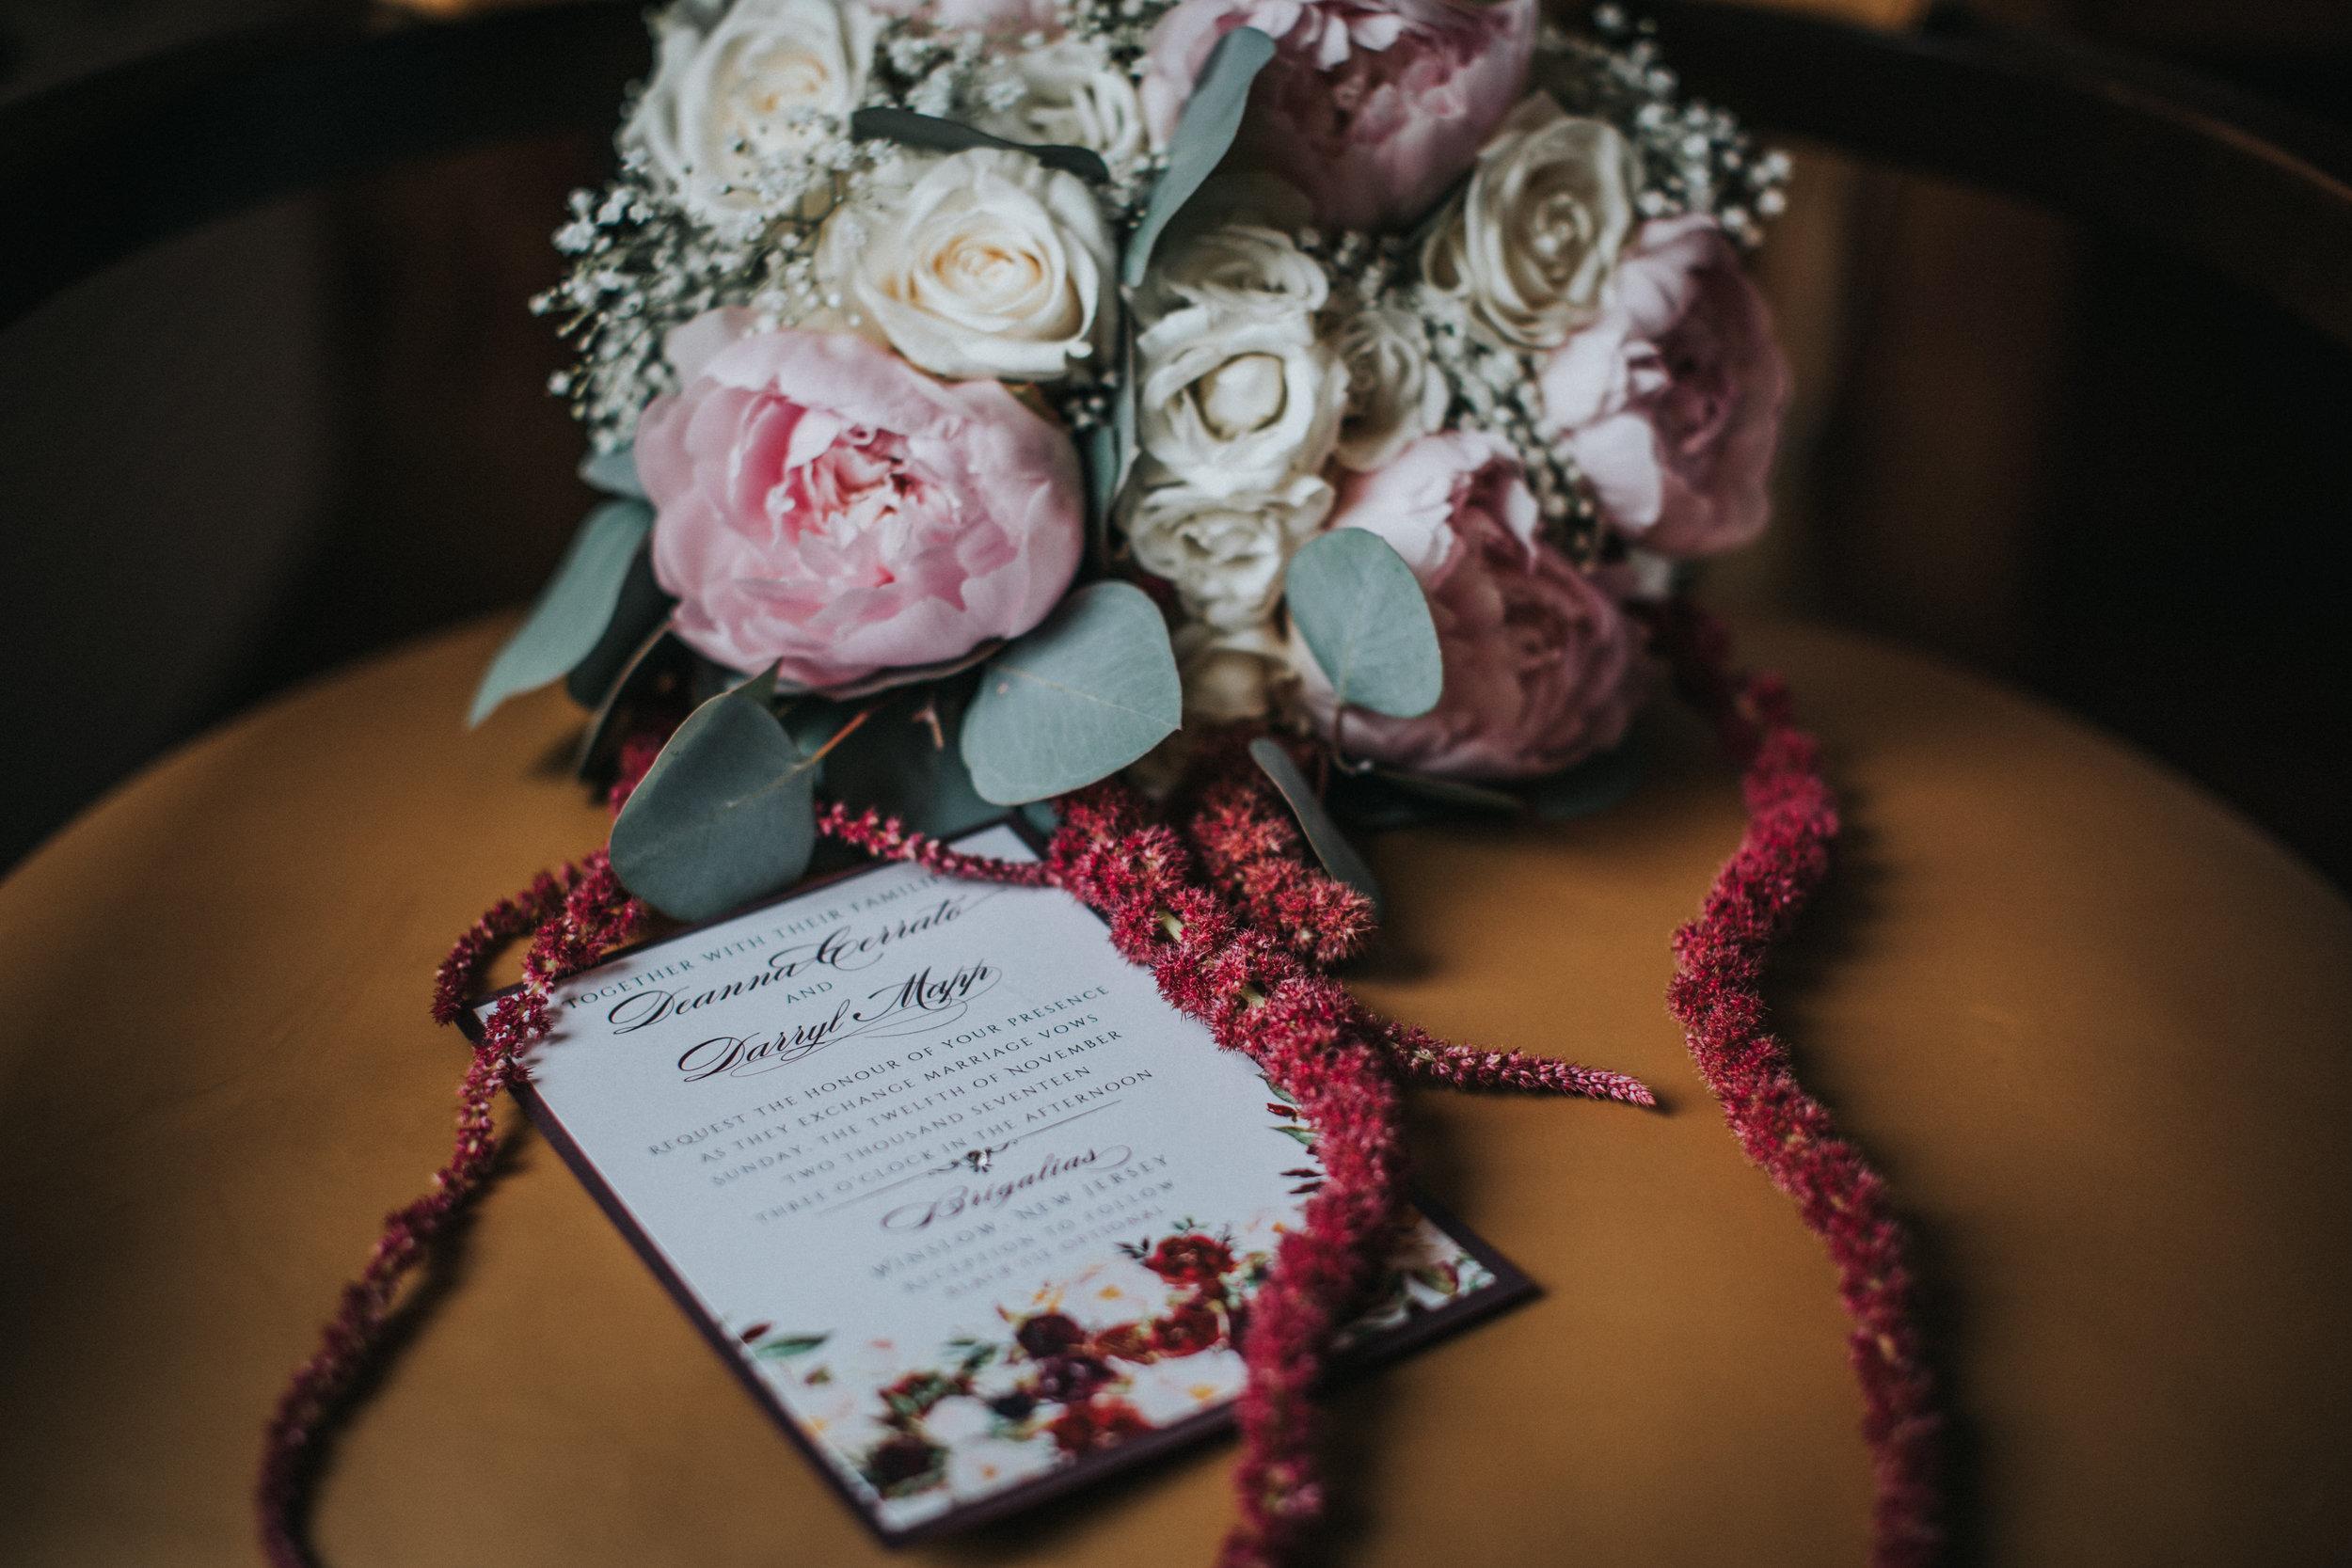 New-Jersey-Wedding-Photography-Brigalias-Deanna&Darryl-GettingReady-122.jpg